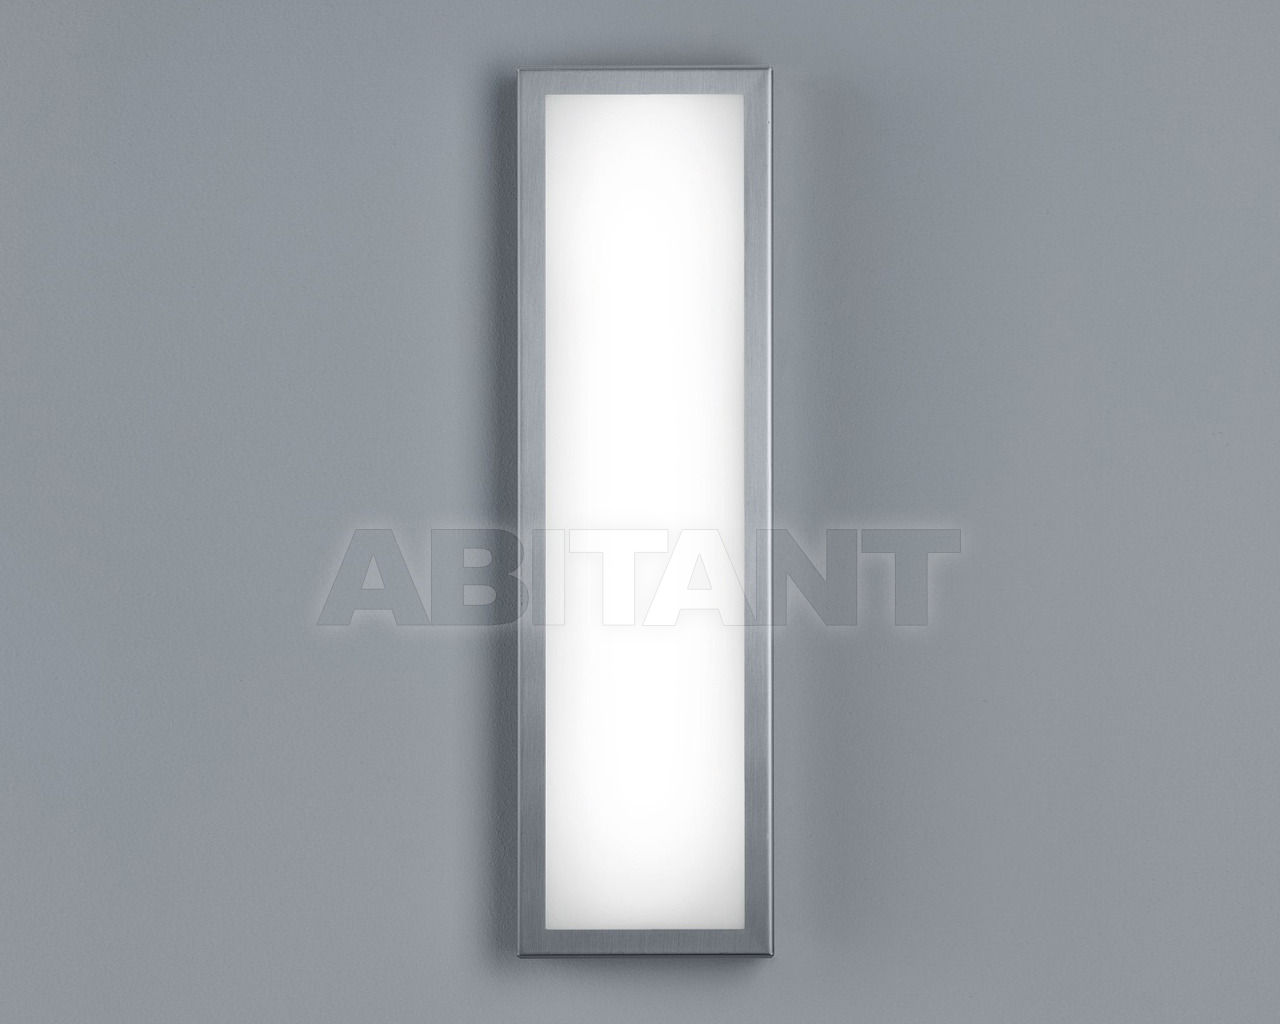 Buy Front light SCALA 44 Helestra Your Light A18054.86